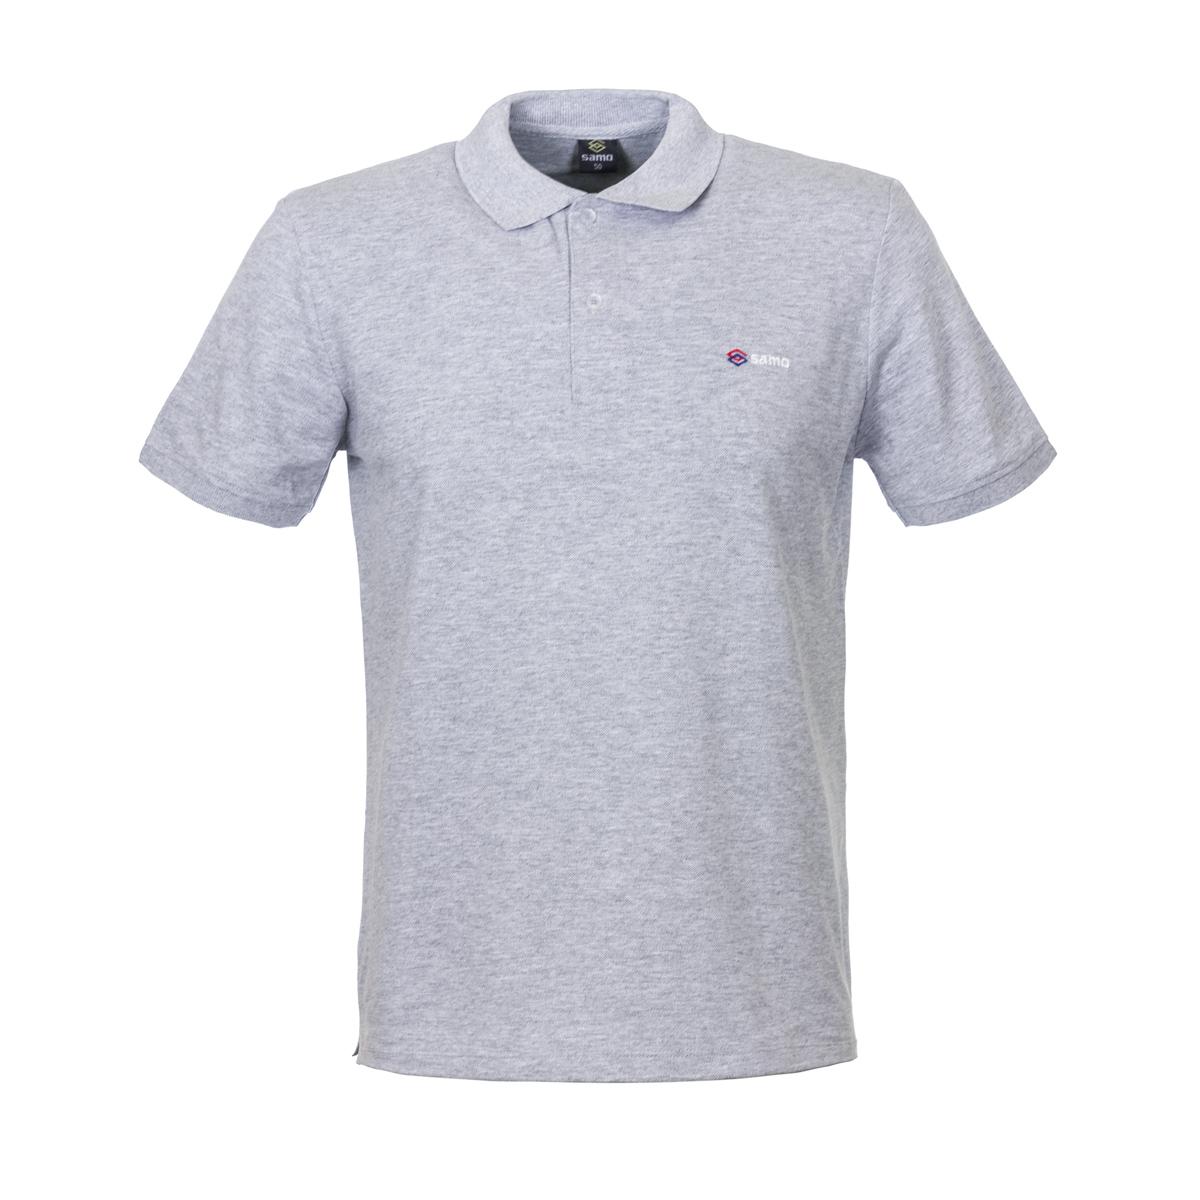 Муж. футболка арт. 04-0048 Серый р. 48 - Мужская одежда артикул: 25698